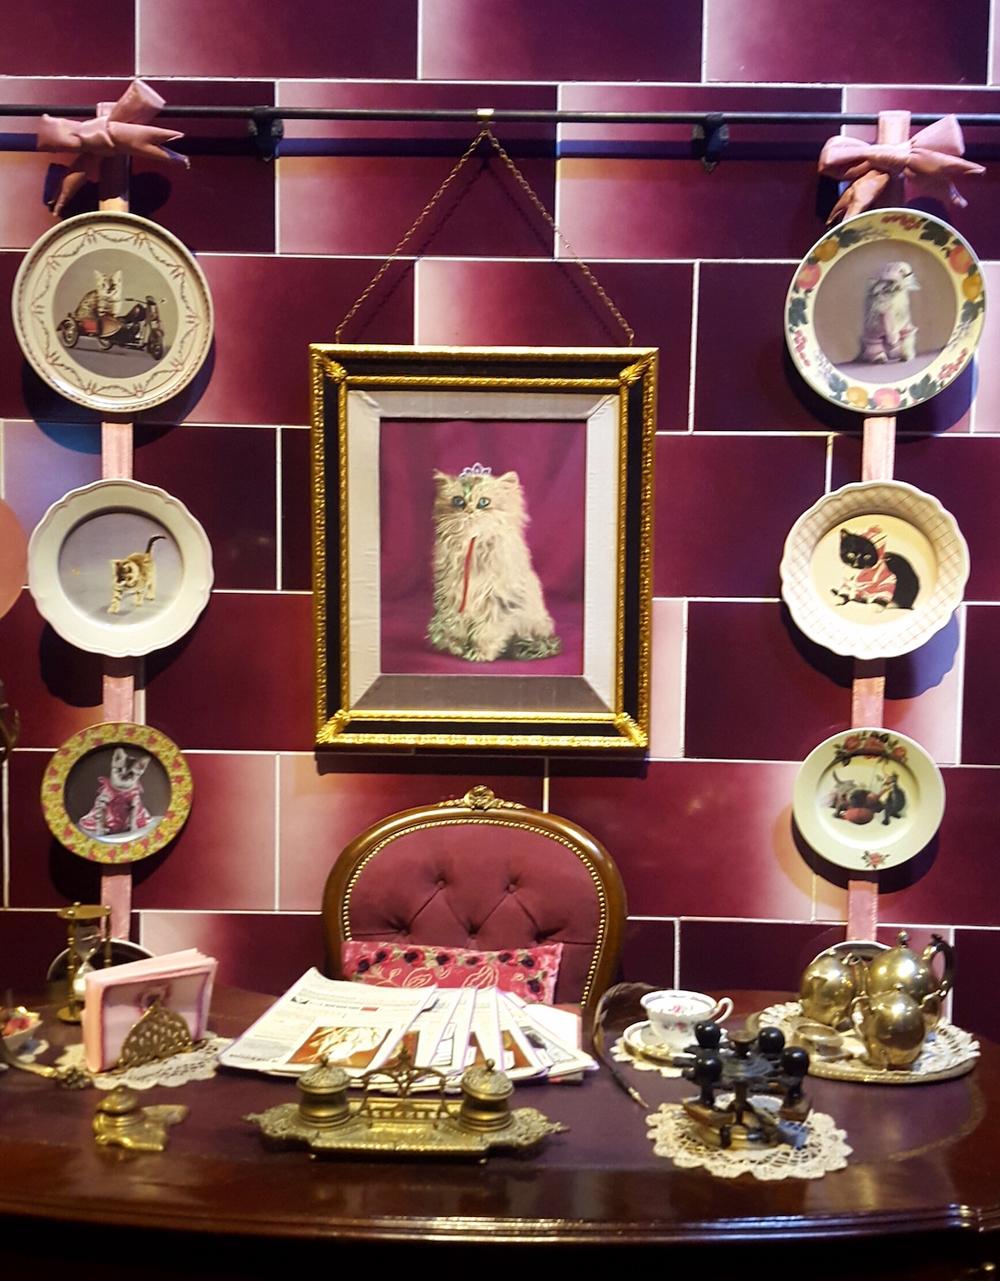 Dolores Umbridge's office